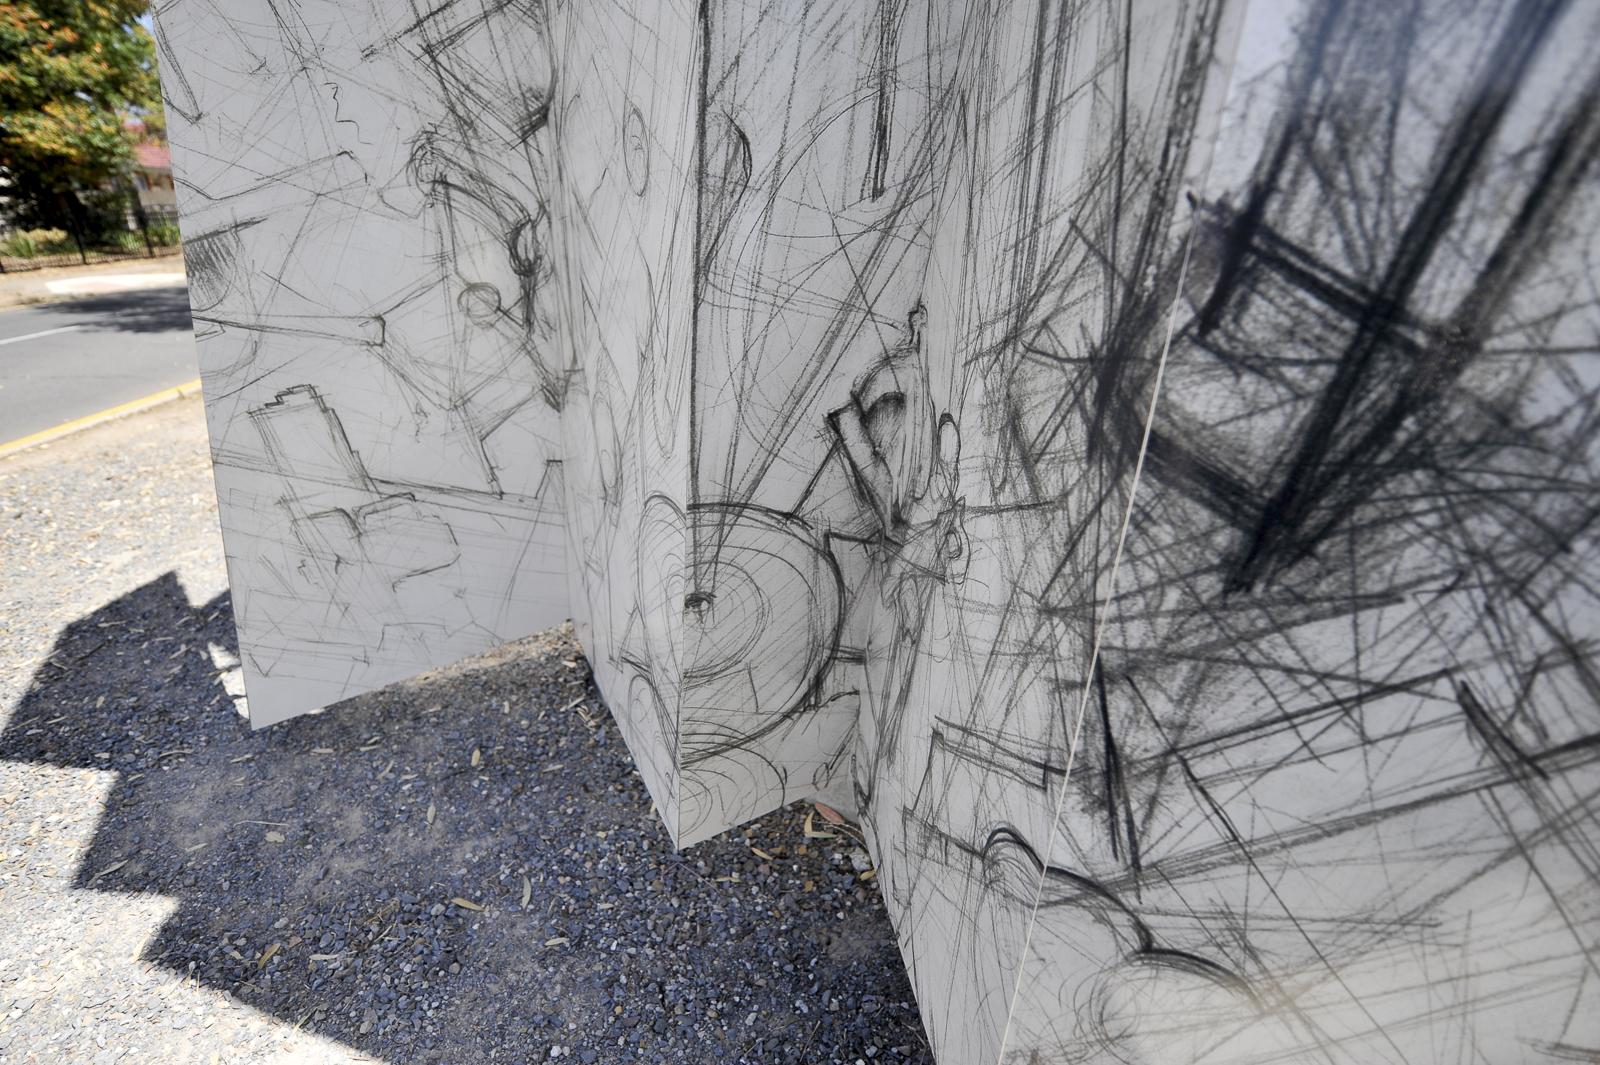 Ascot Park Public Artwork 2